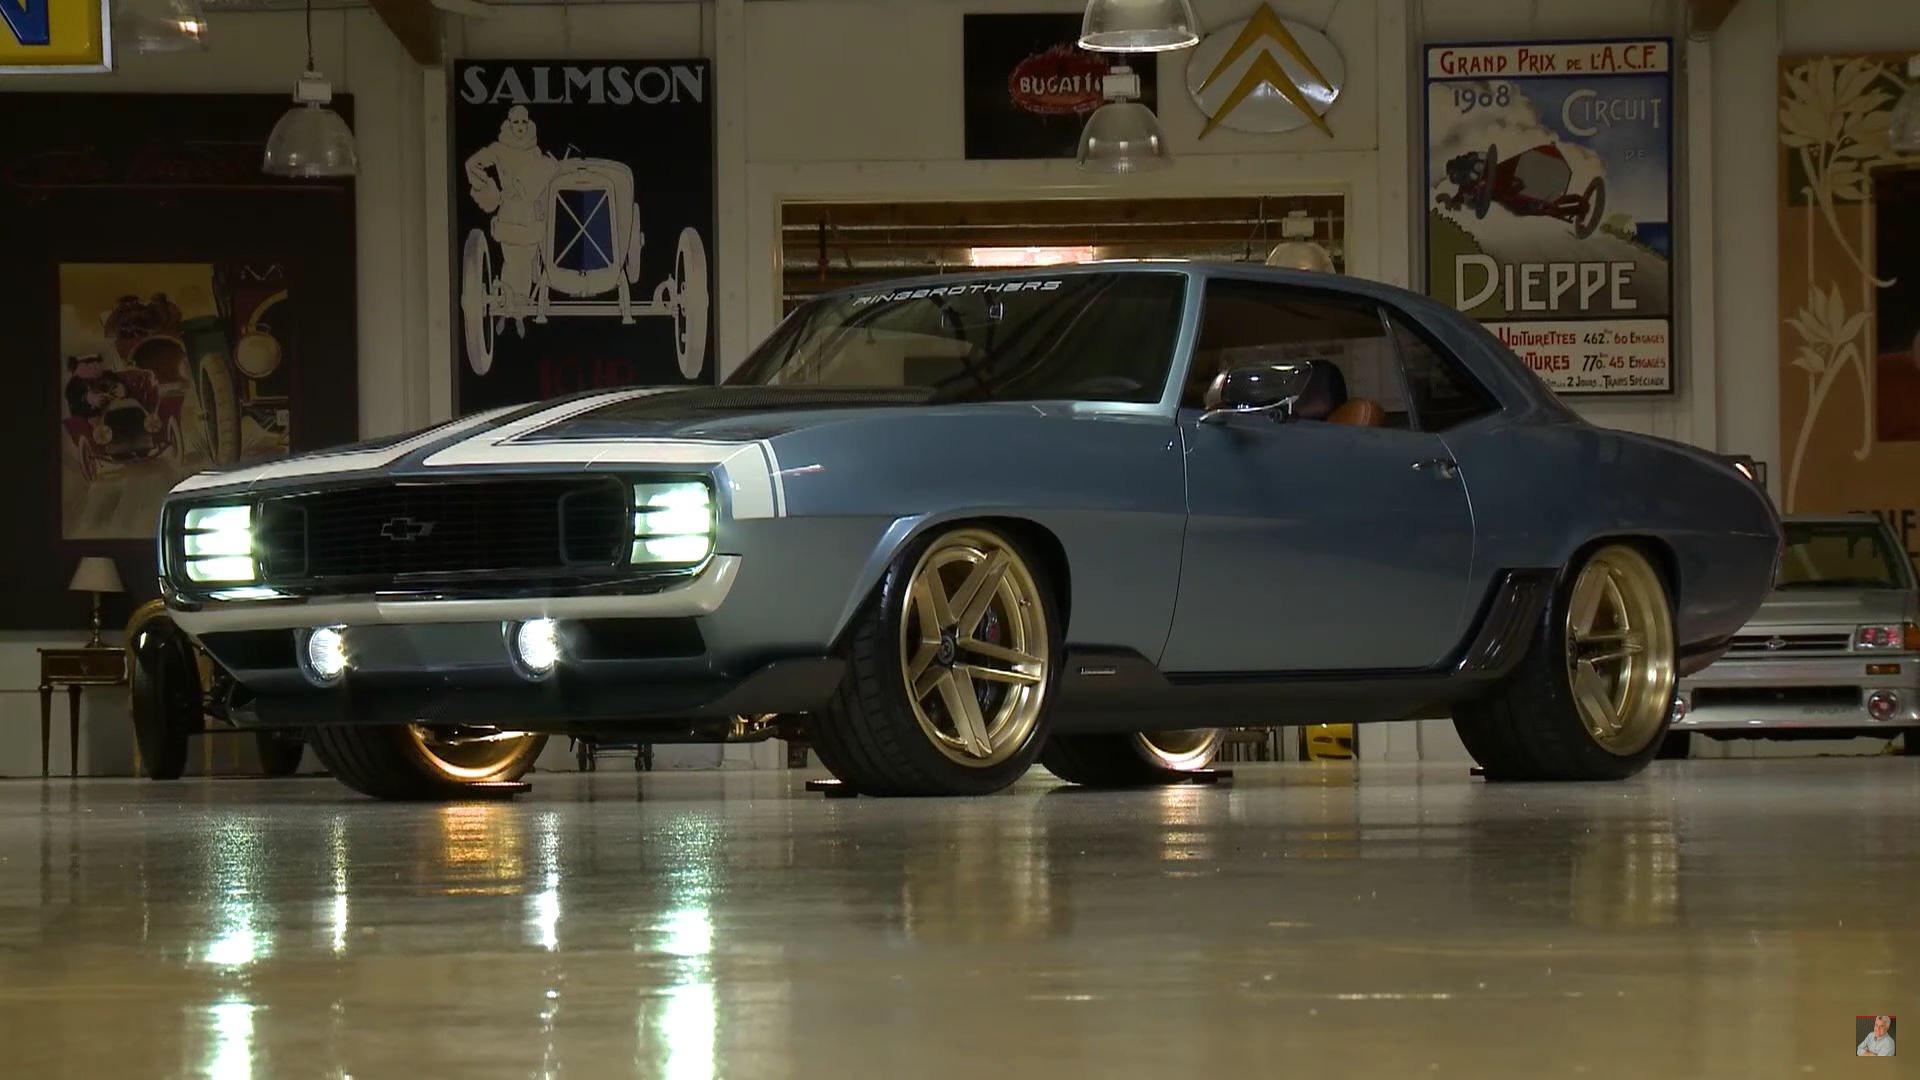 Ringbrothers' 1969 Chevy Camaro G-Code hits the spot for Jay Leno